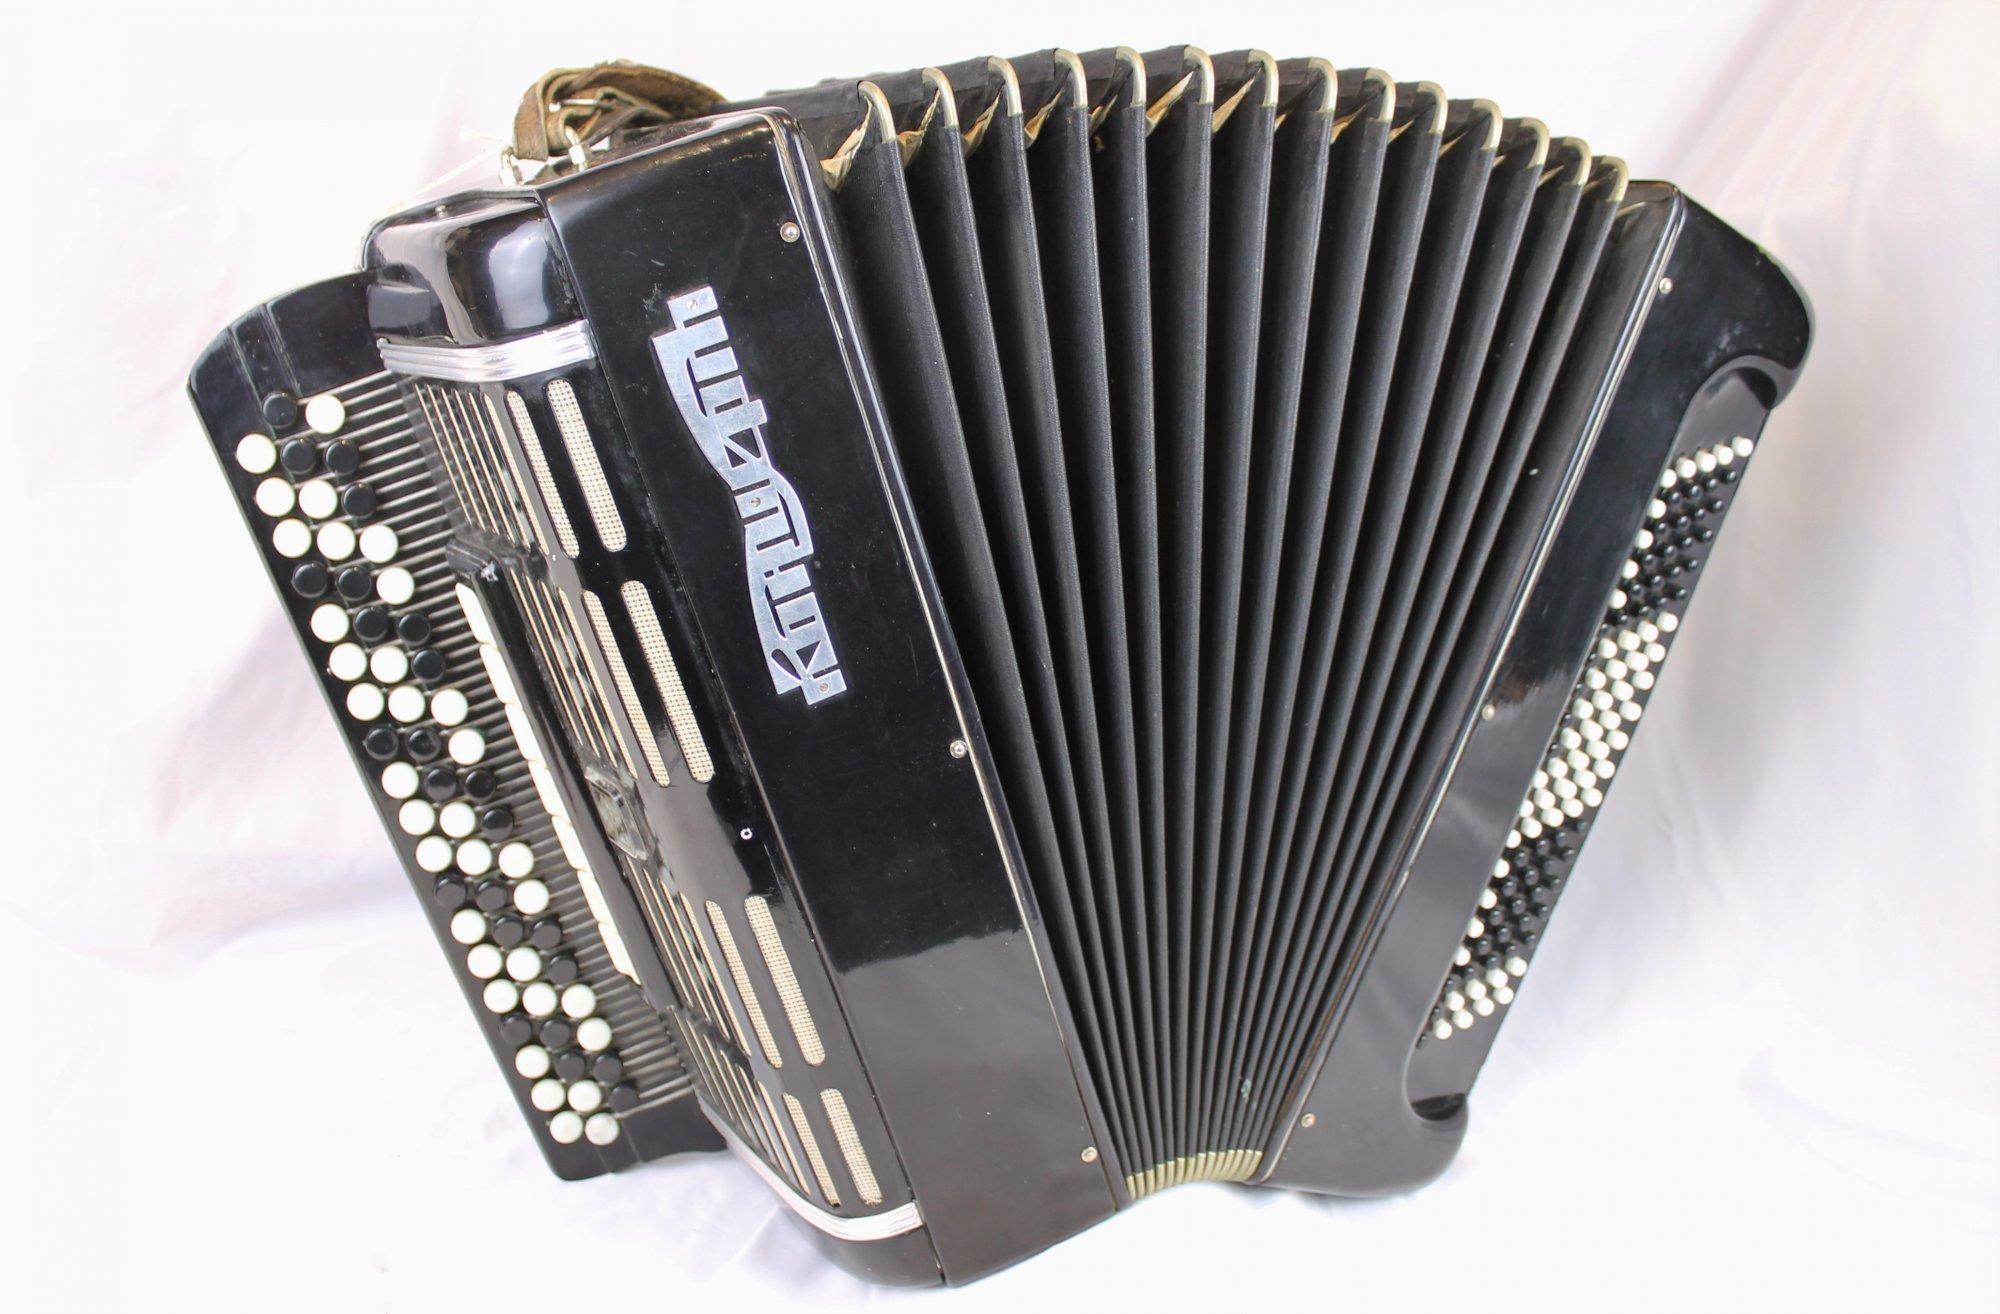 4549 - Black Concerto Bayan Chromatic Button Accordion LMMH 58 120